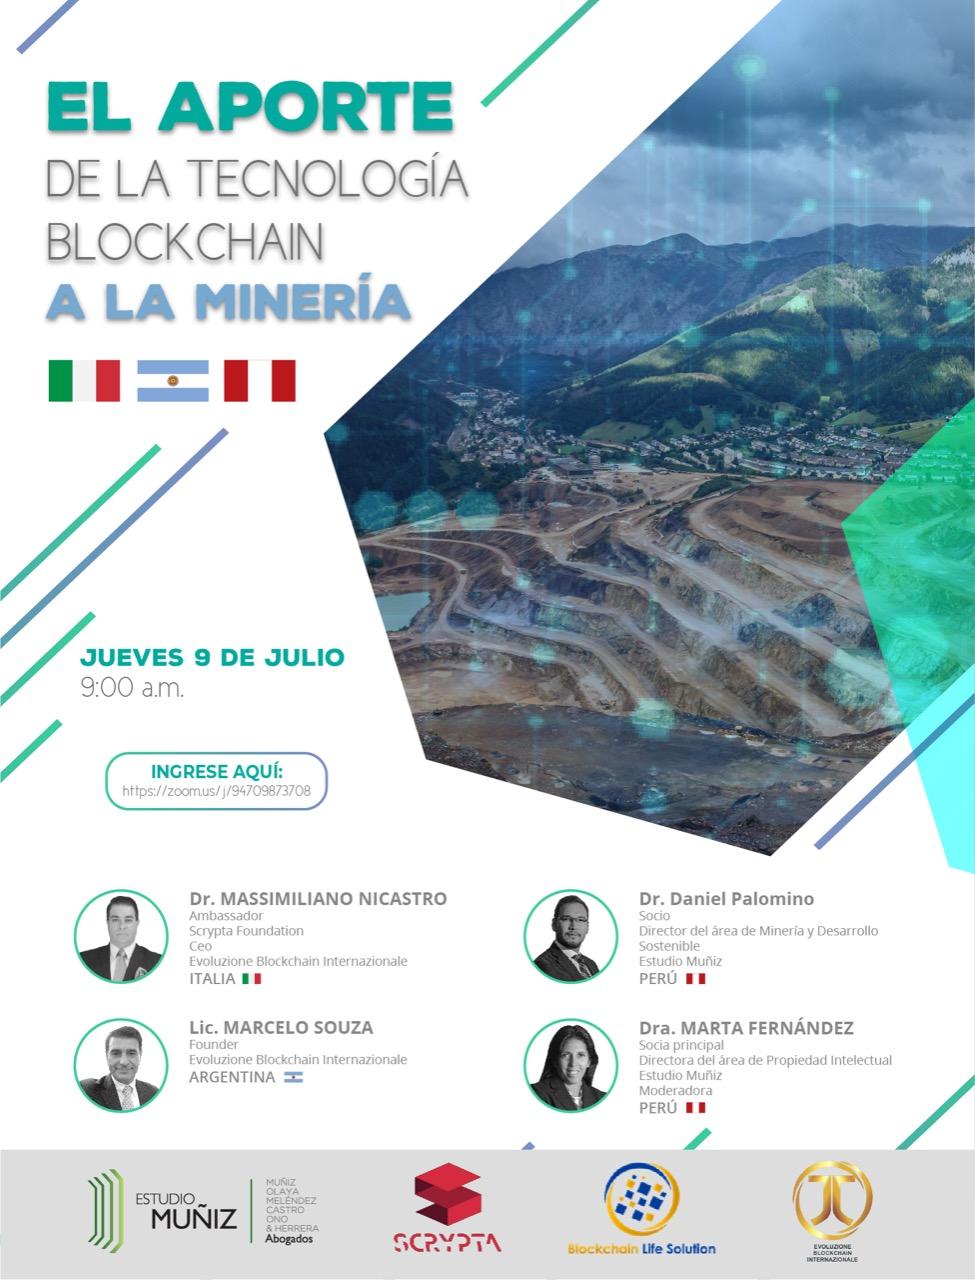 El Aporte de la Blockchain a la Mineria